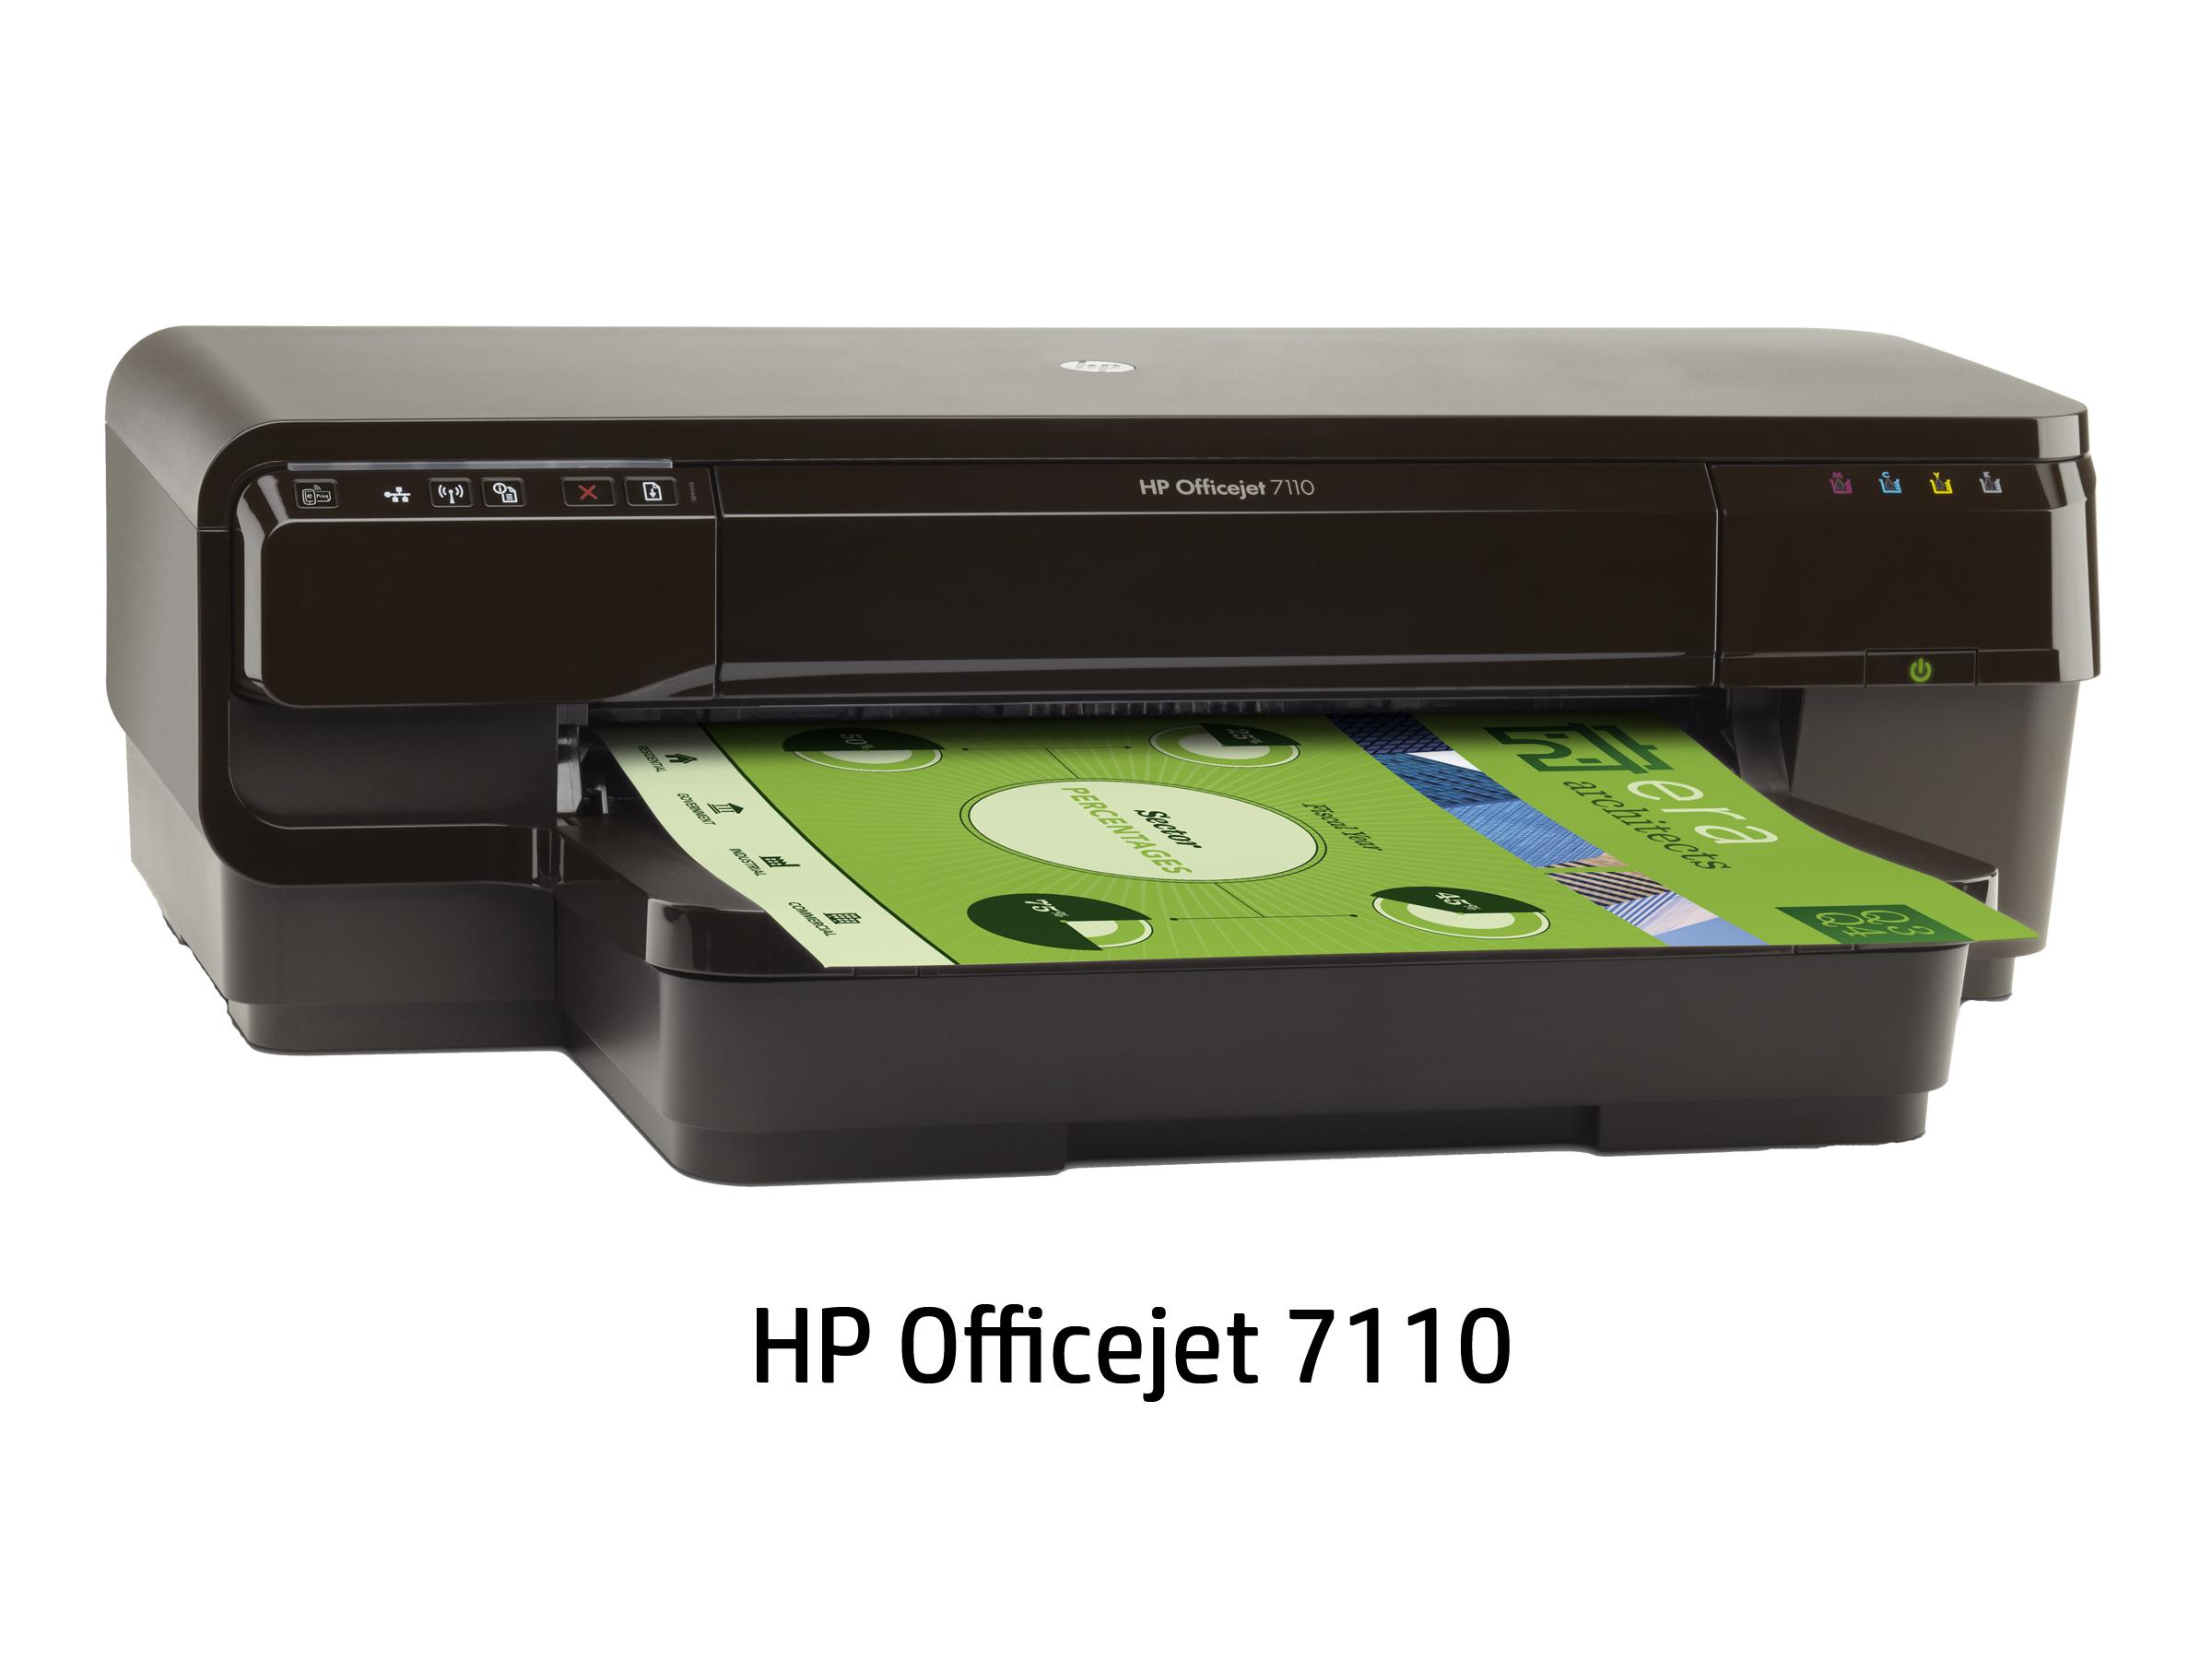 [Officejet]ビジネスプリンター 7110(4色独立インクジェット/LAN/W-LAN/USB2.0/A3プラス) CR768A#ABJ